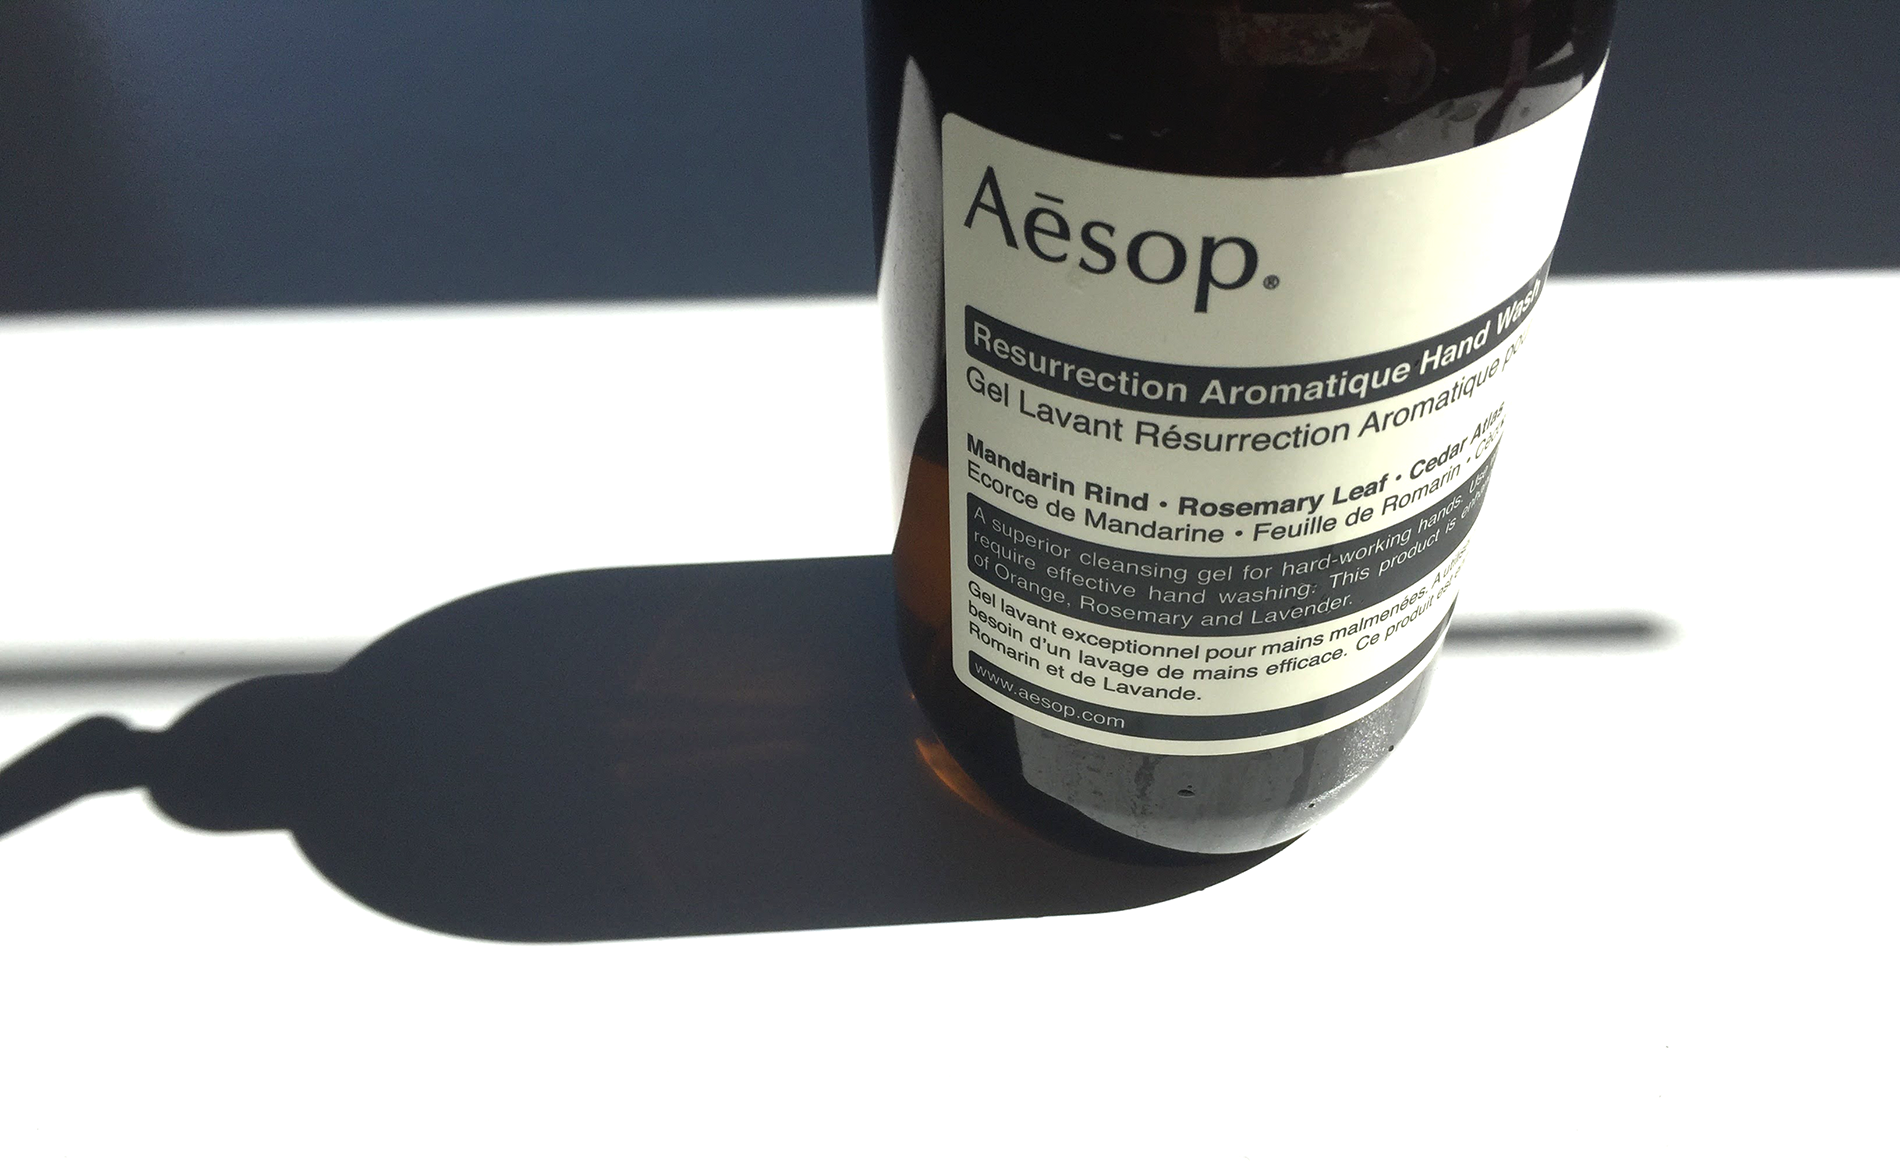 Aesop2